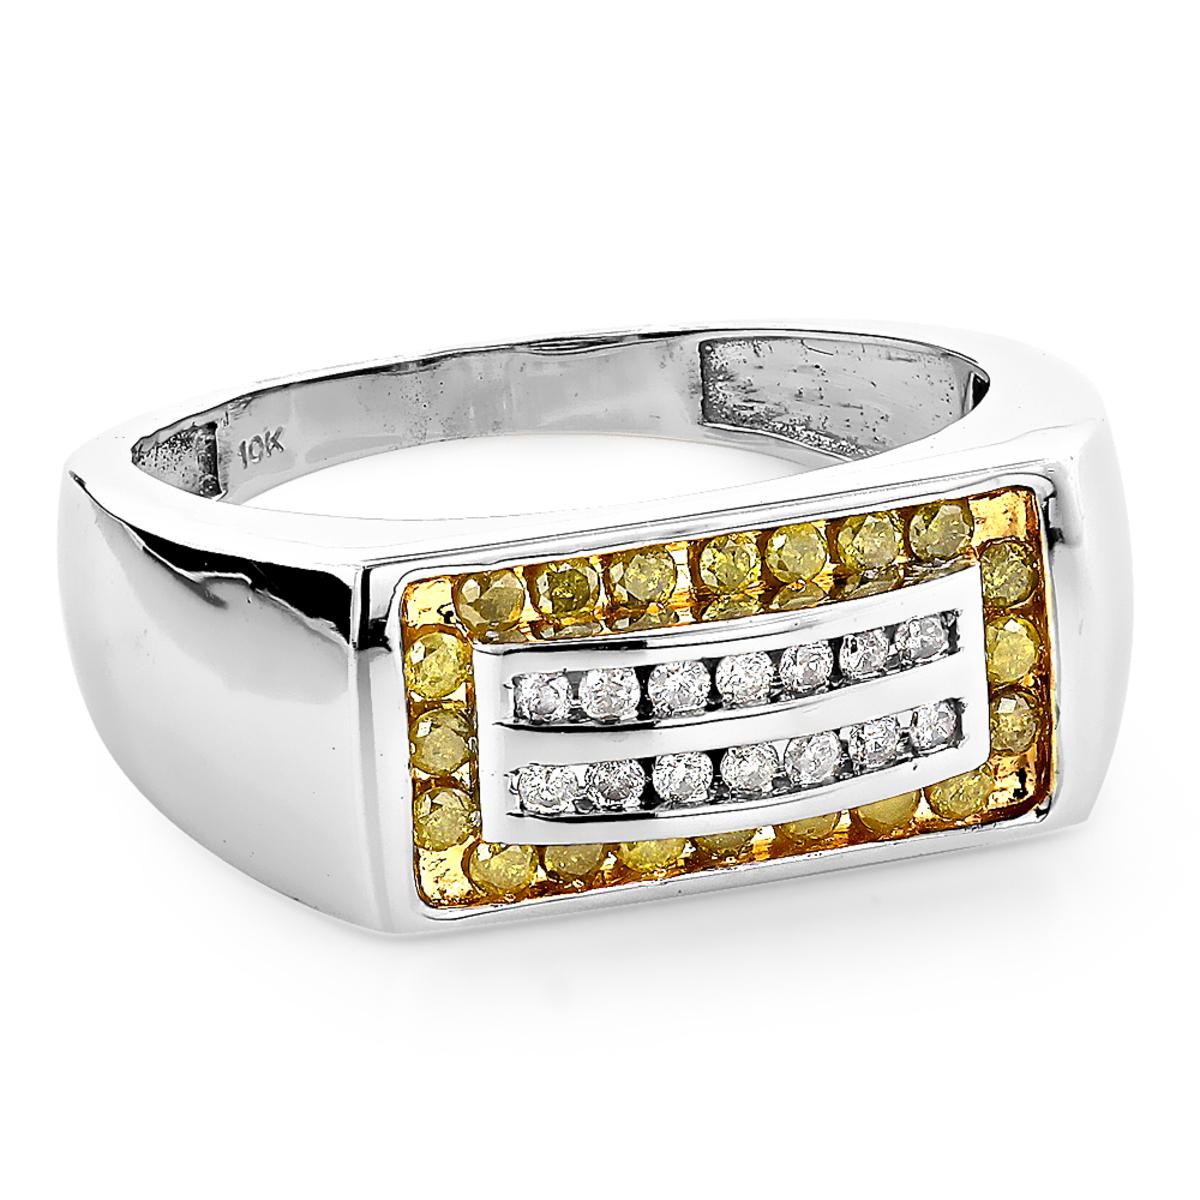 Unique Men's Diamond Bands 10k Gold White & Yellow Diamonds Pinky Ring